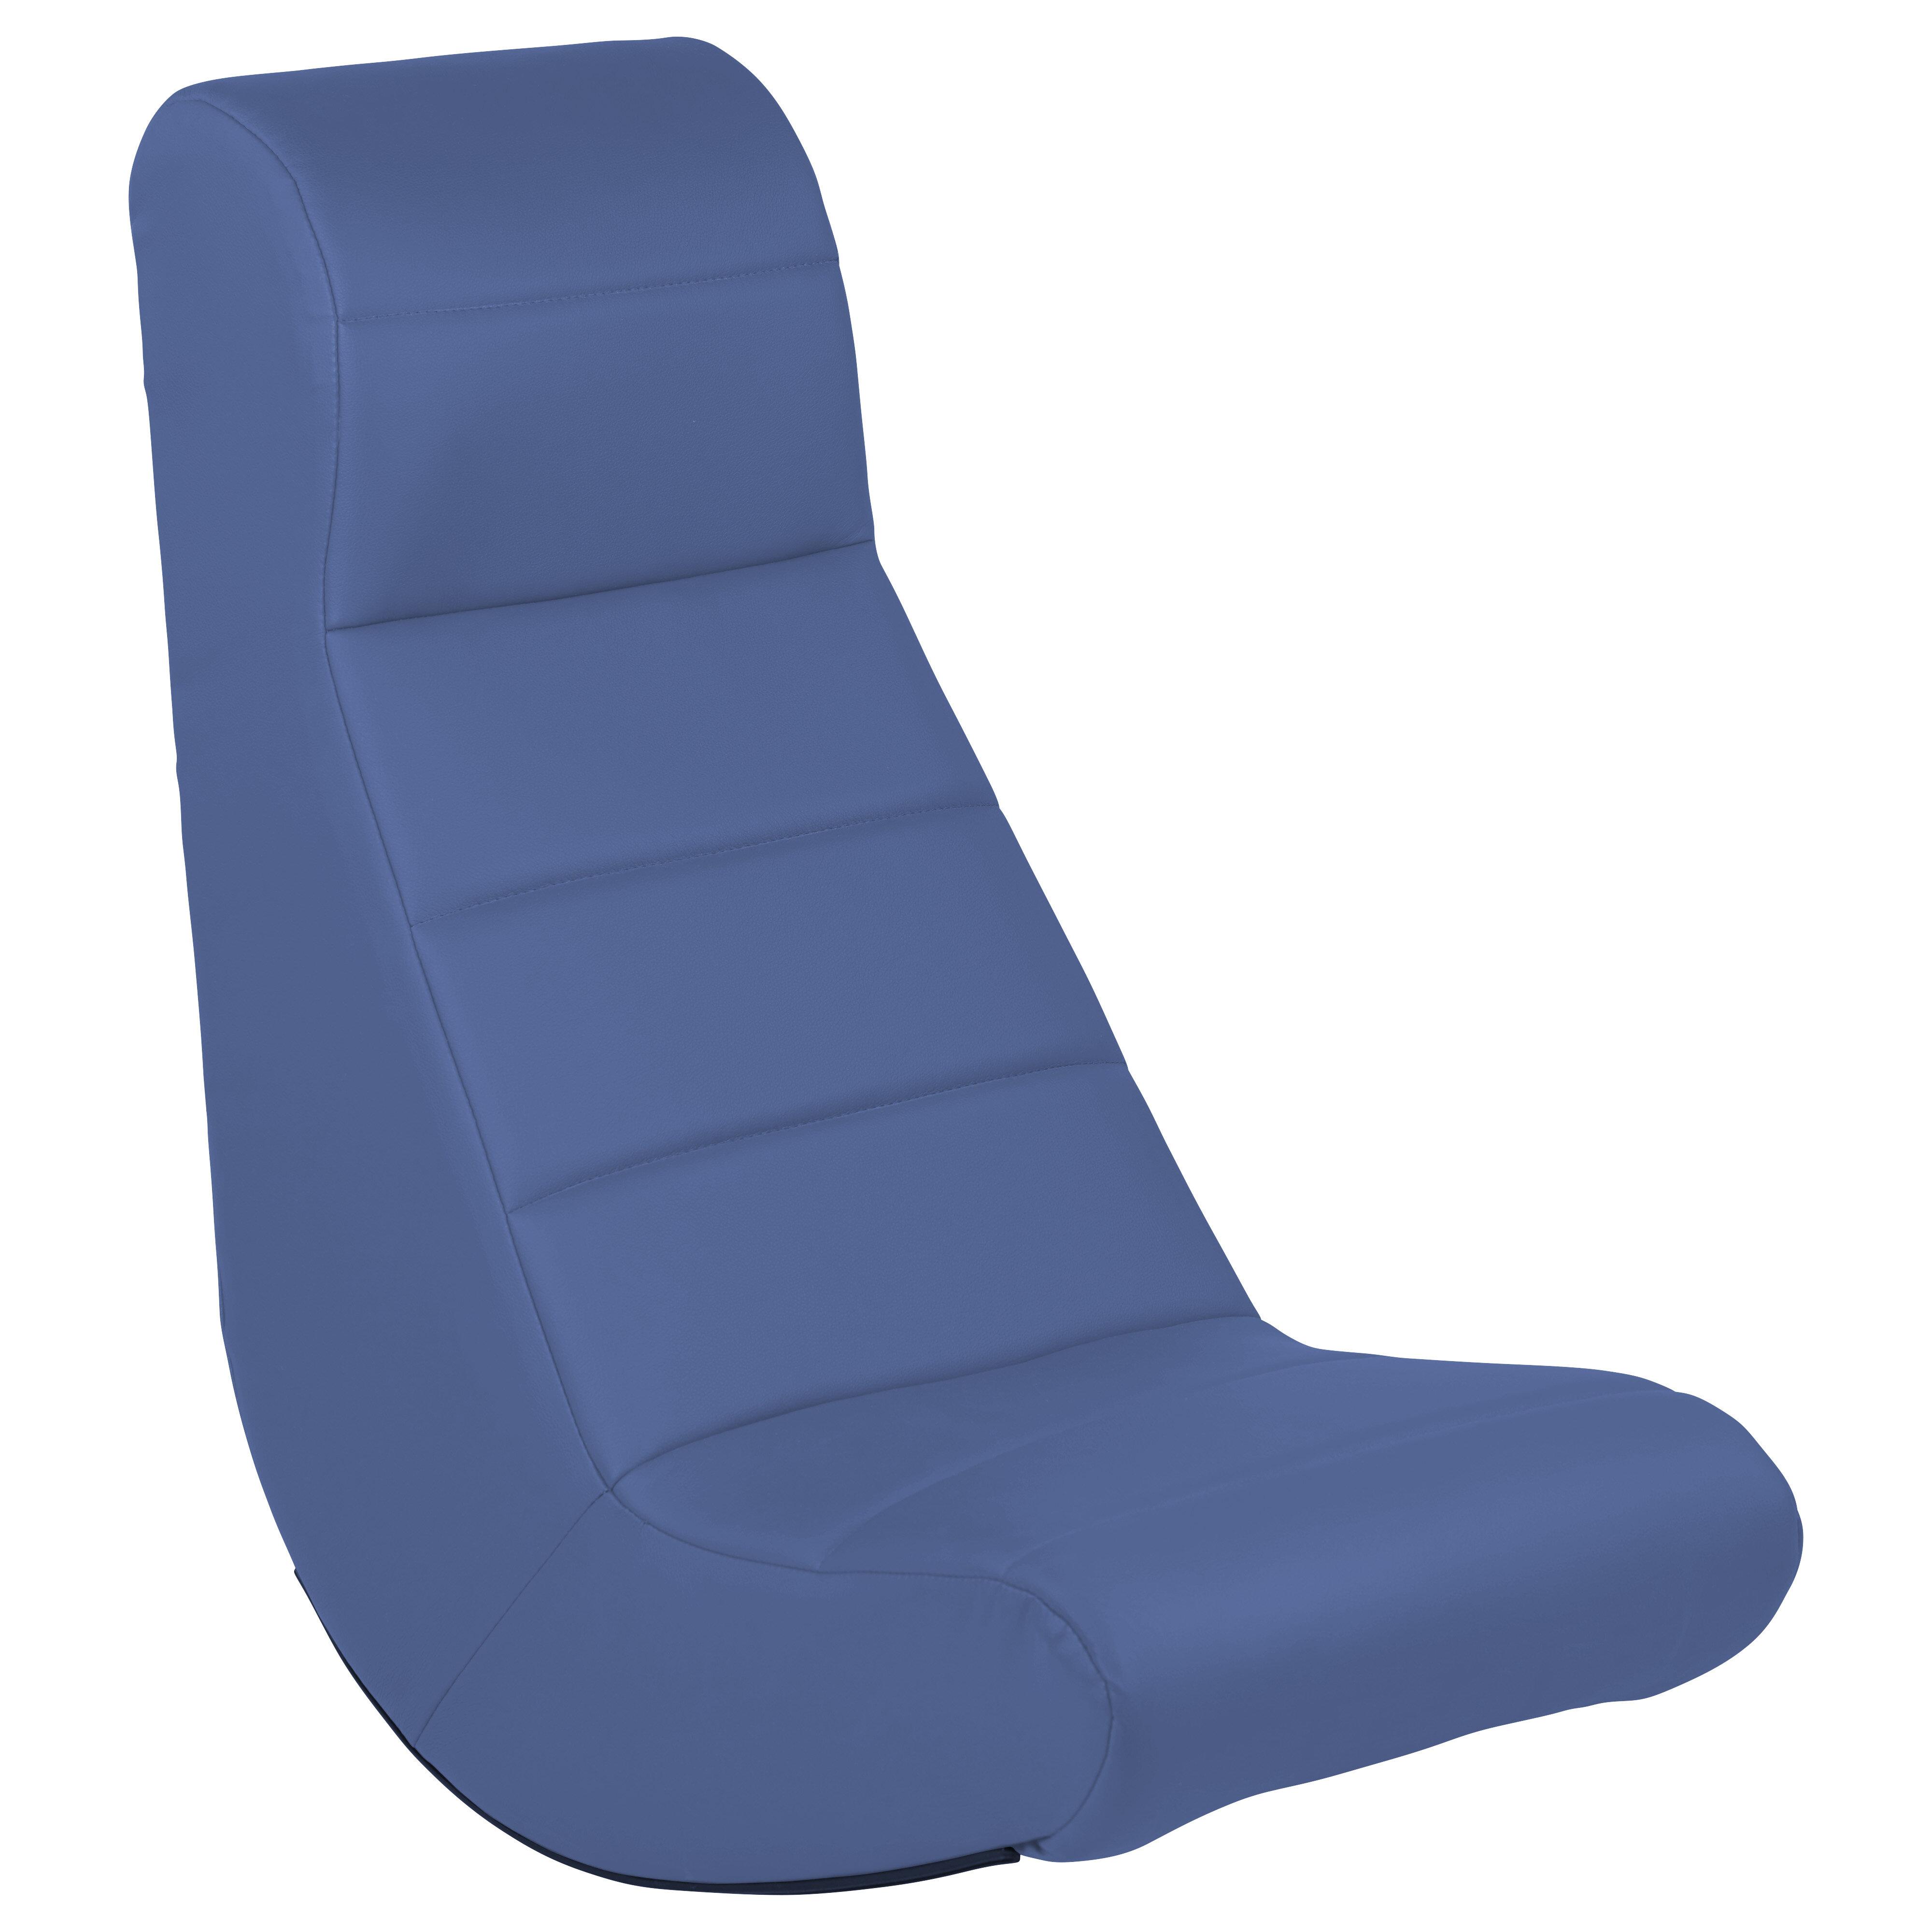 Factory Direct Partners Horizontal Soft Video Rocker Game Chair